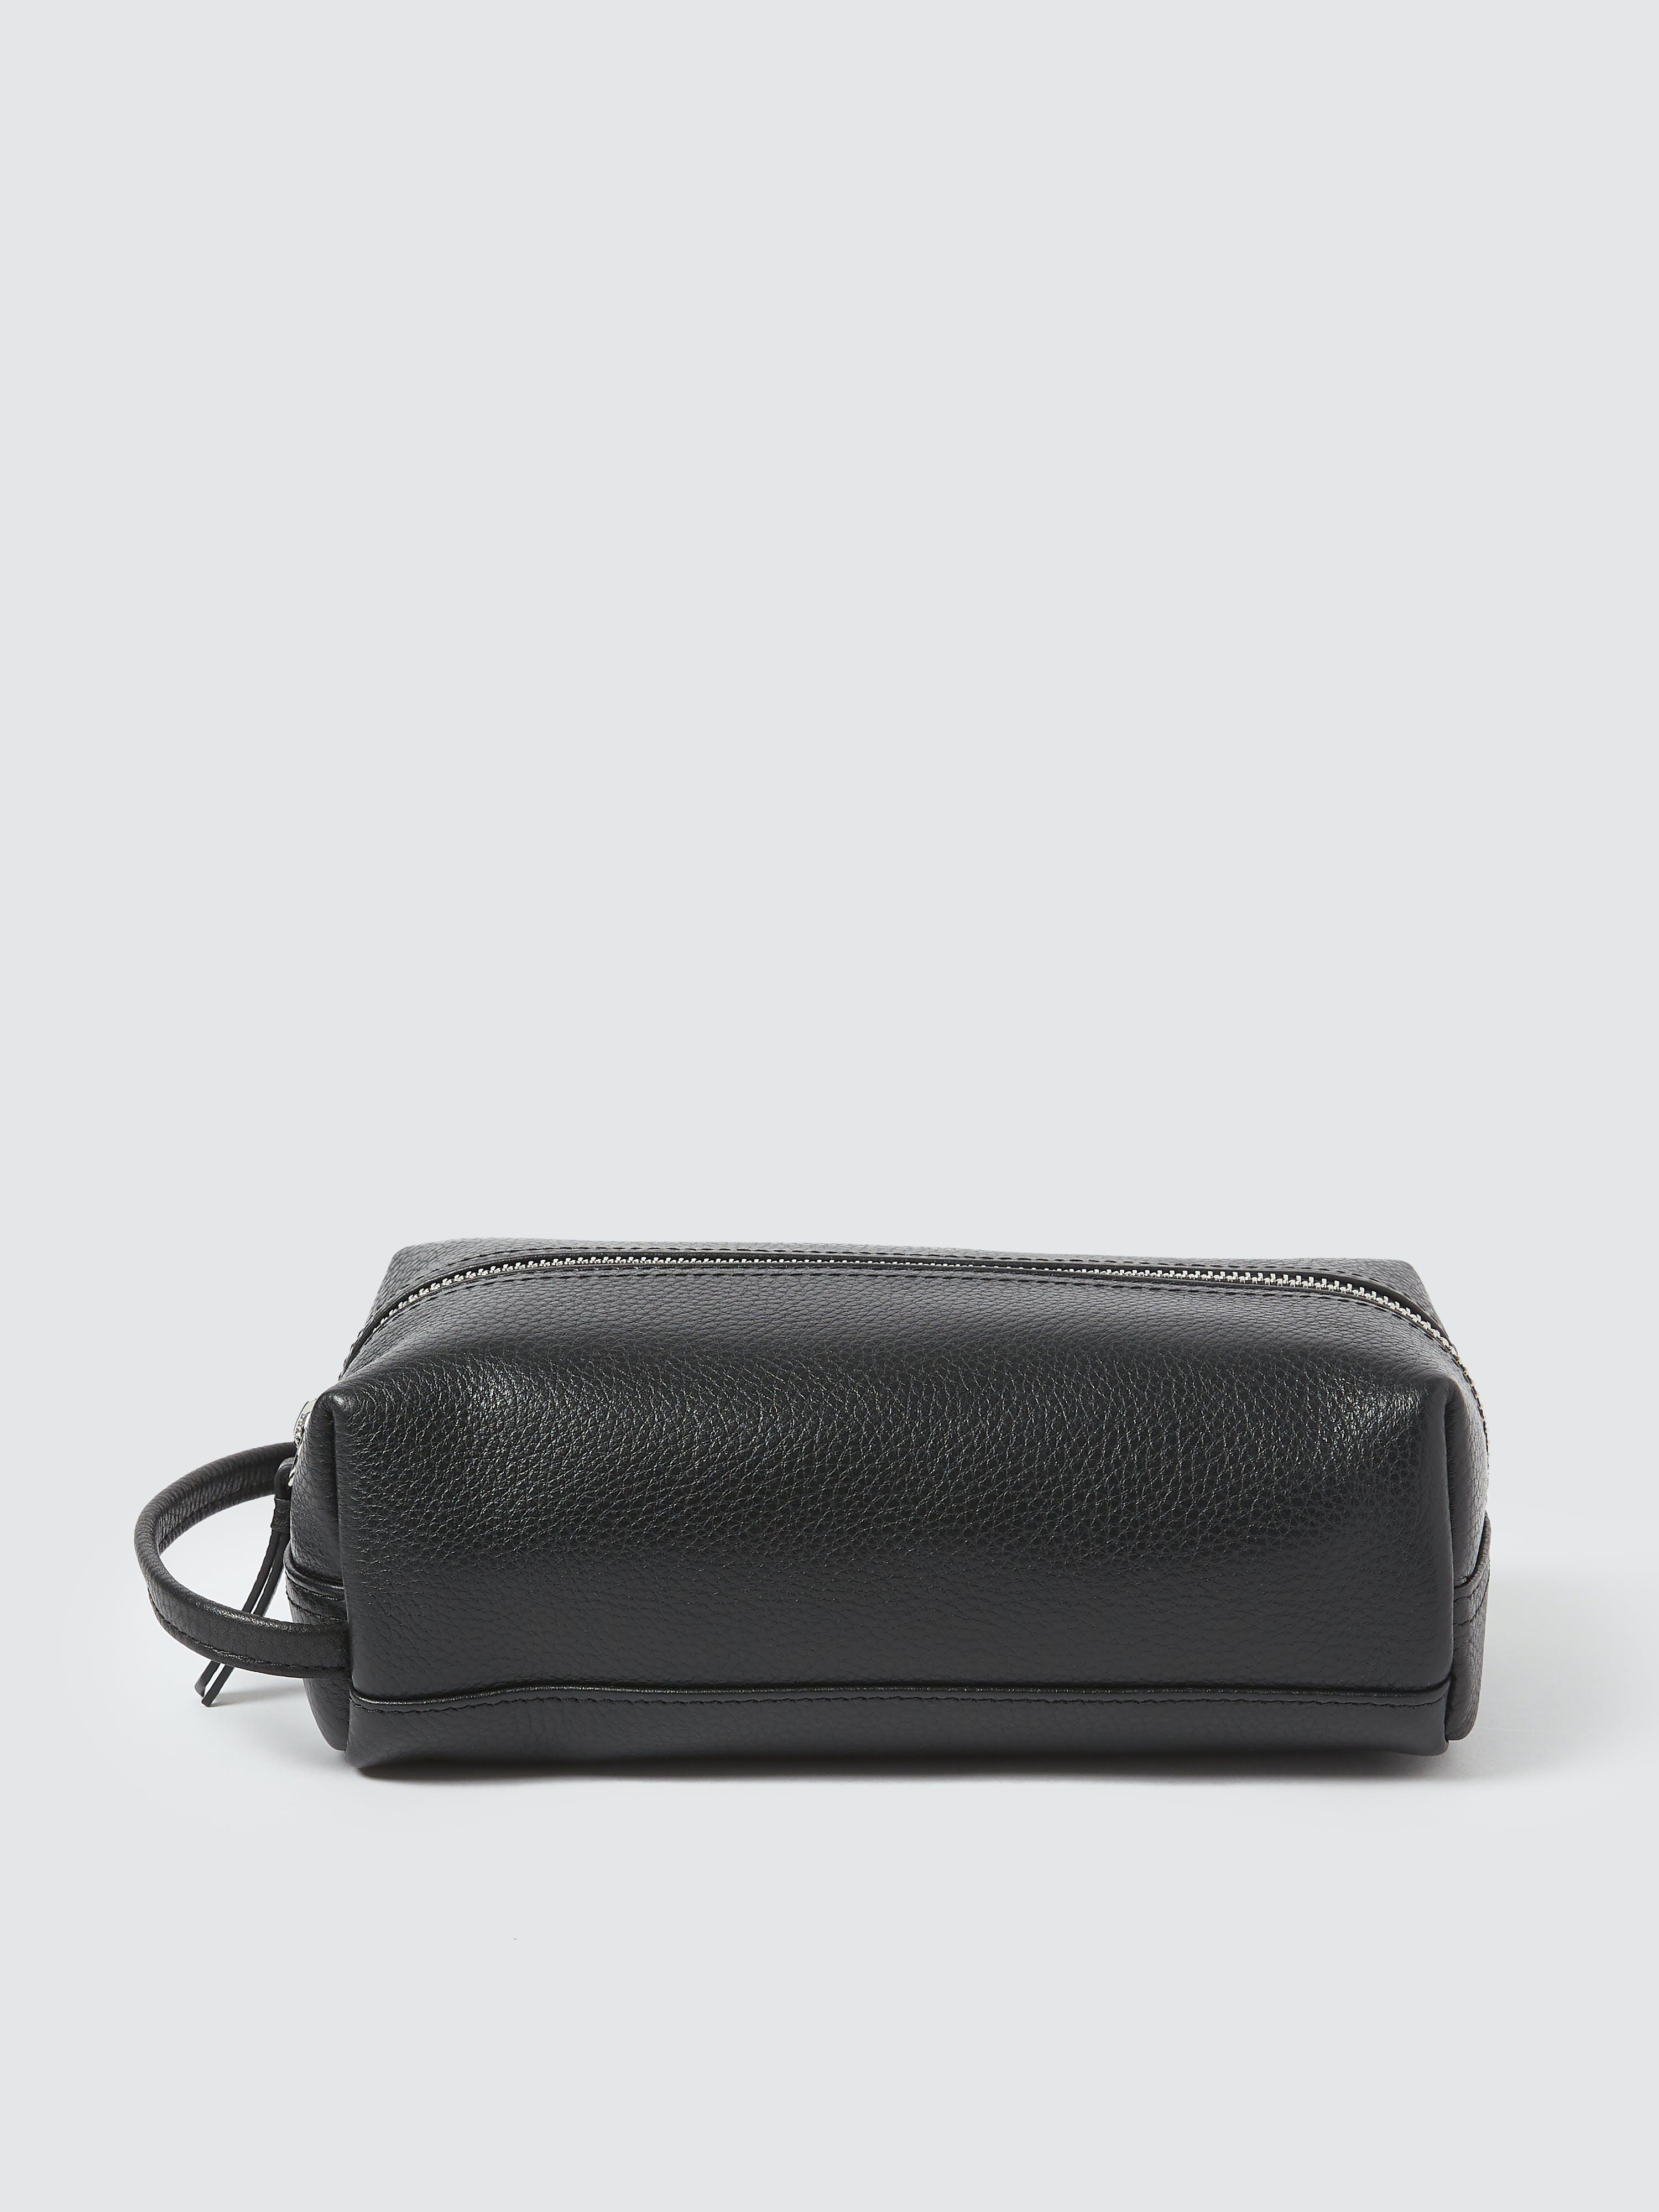 ROYCE New York Compact Toiletry Bag  - Black